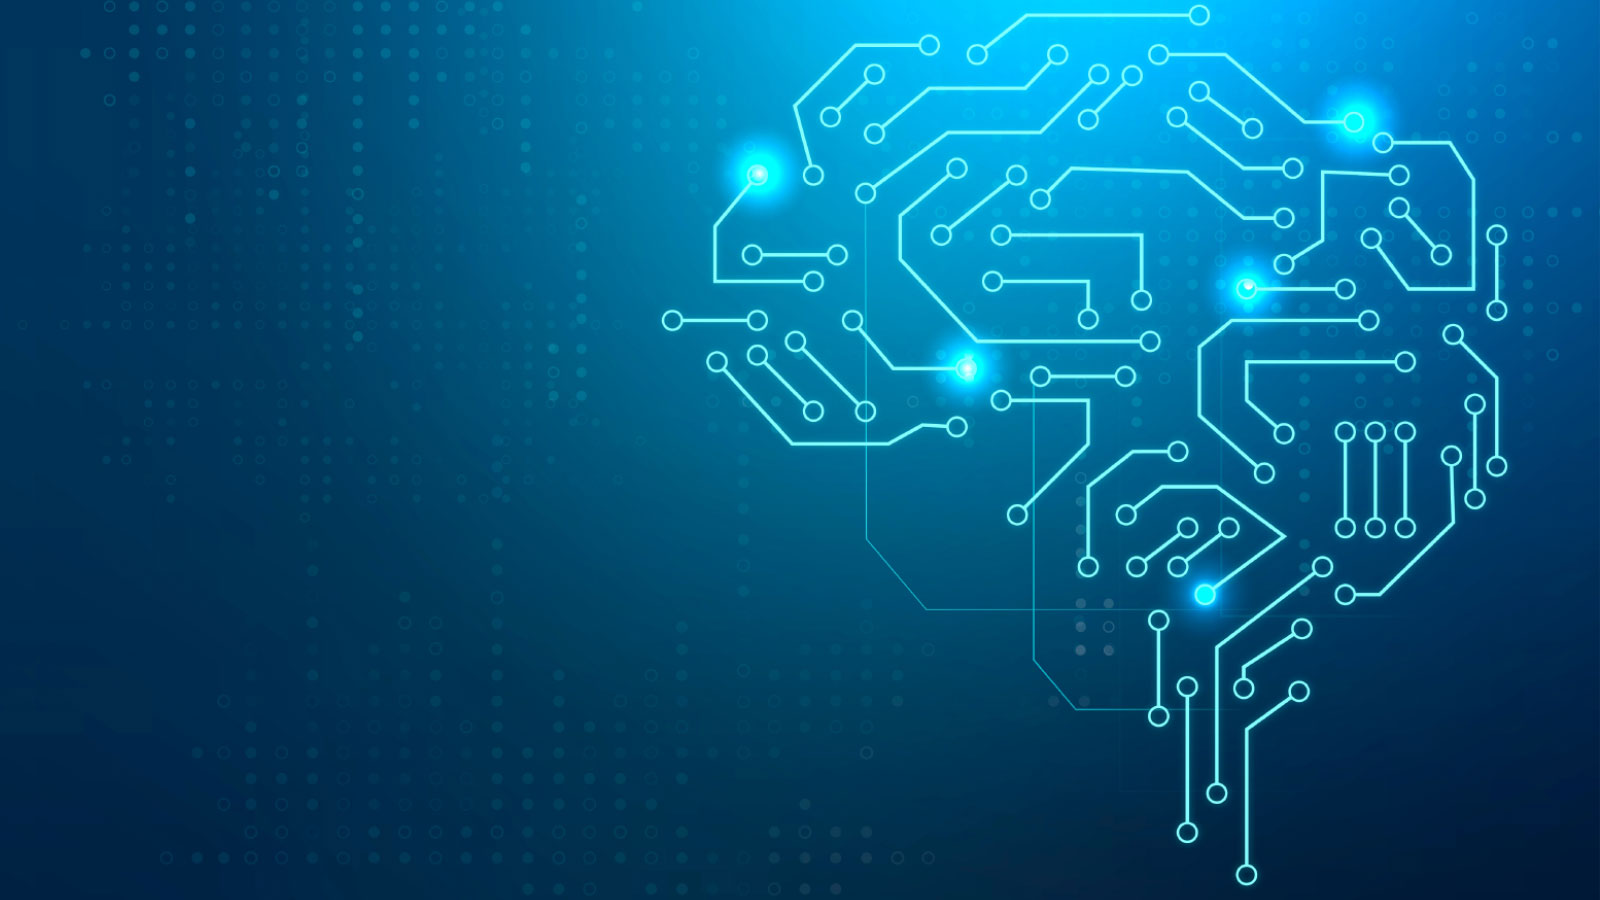 Digitized brain as machine learning representation